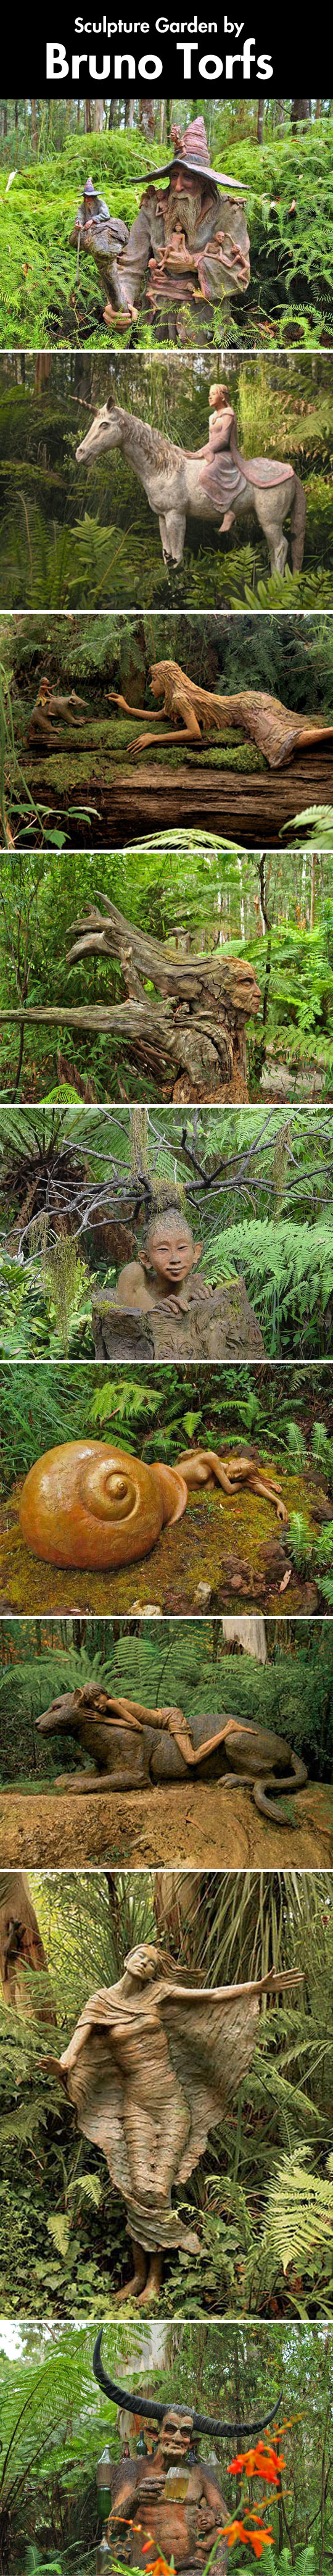 cool-forest-artist-wood-nature-spirit